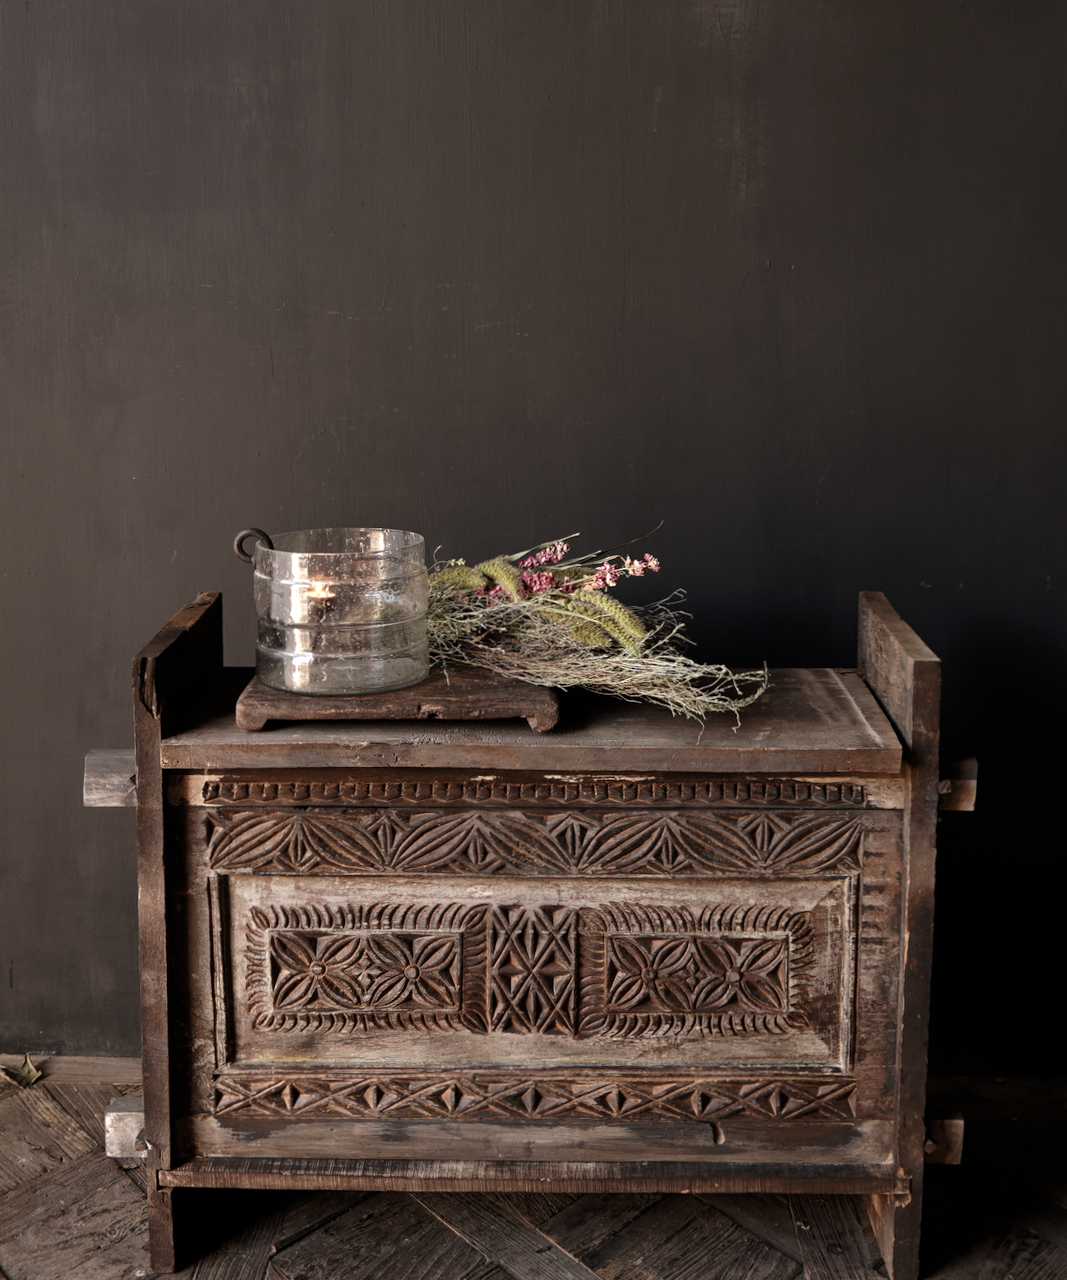 Stoere oude Himalaya   Kist / Box  met hout snijwerk-1